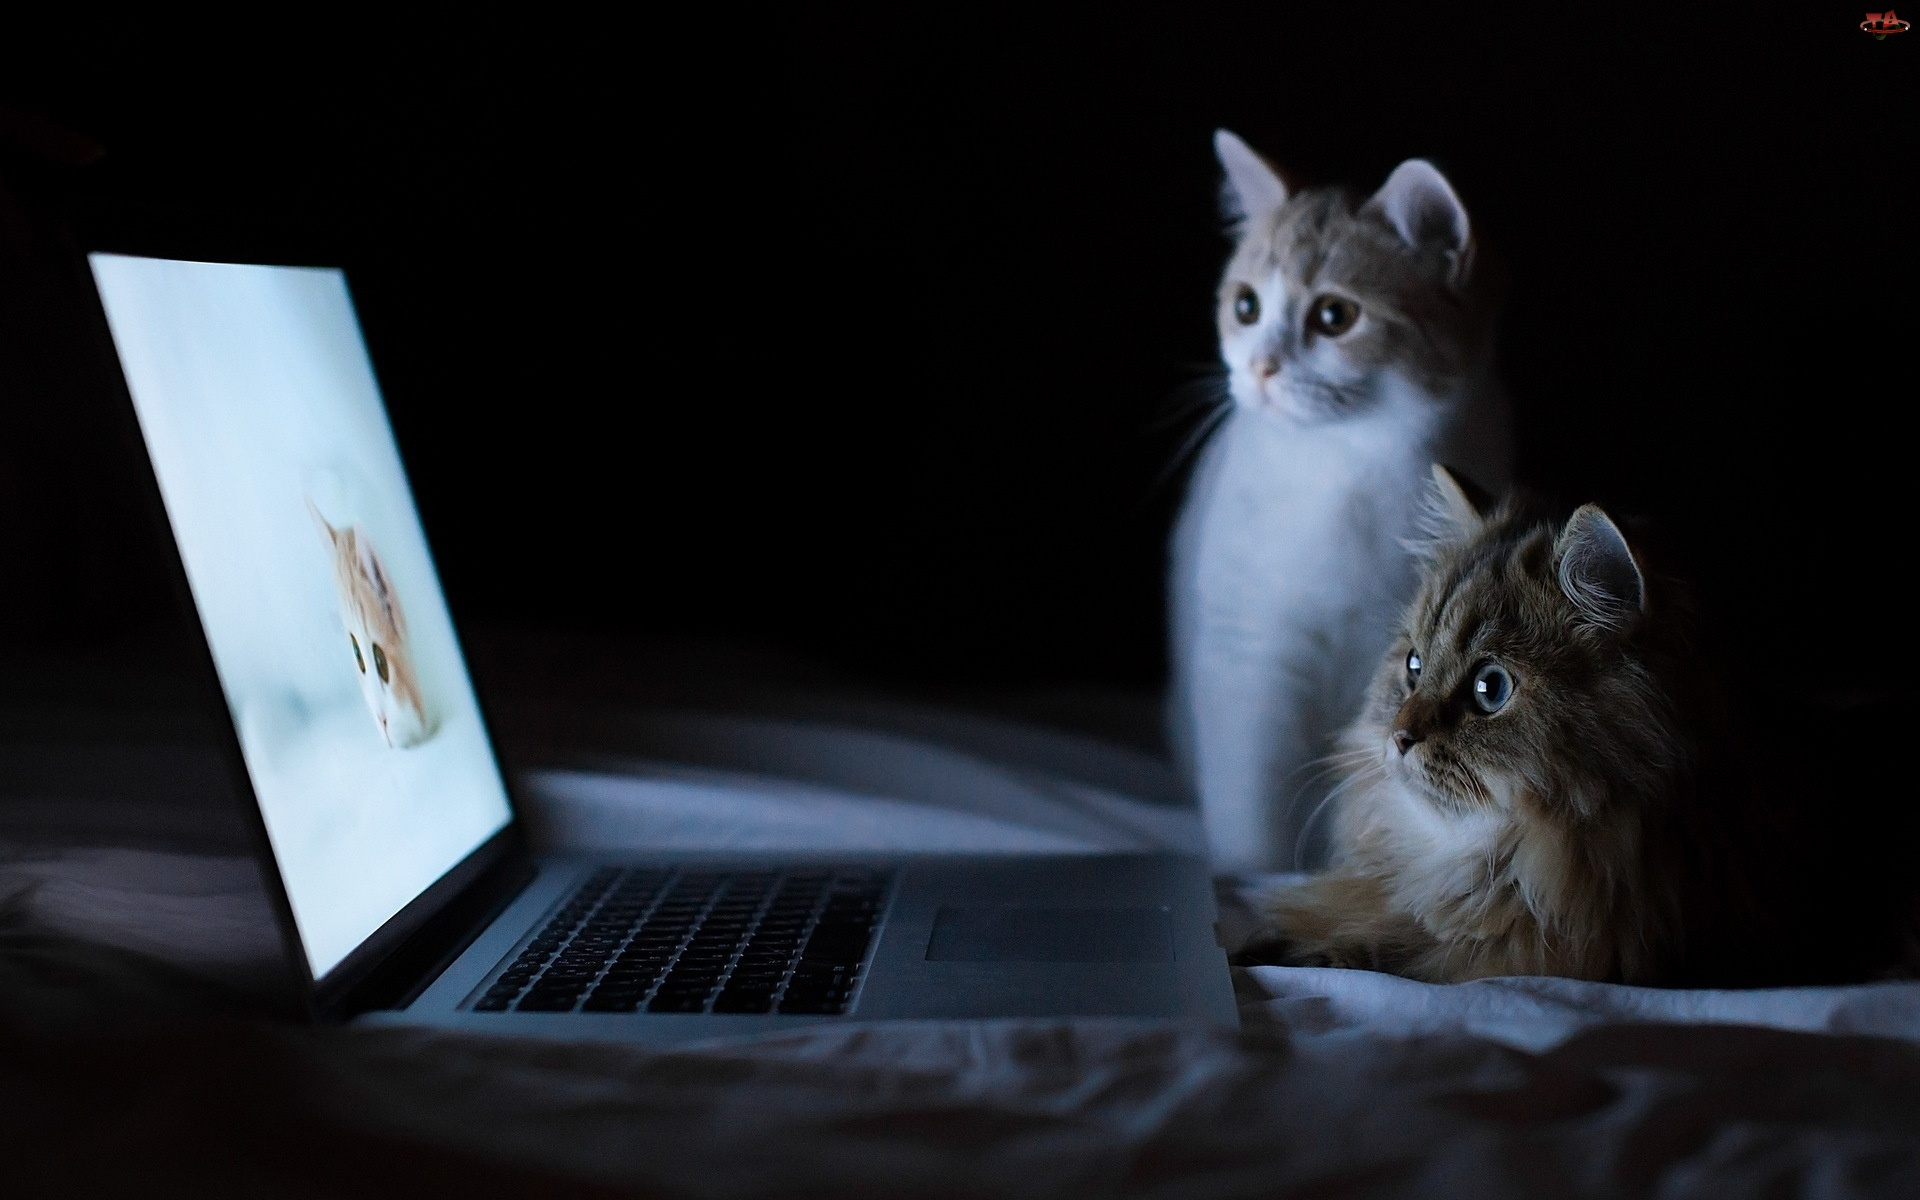 Dwa, Laptop, Słodkie, Kotki